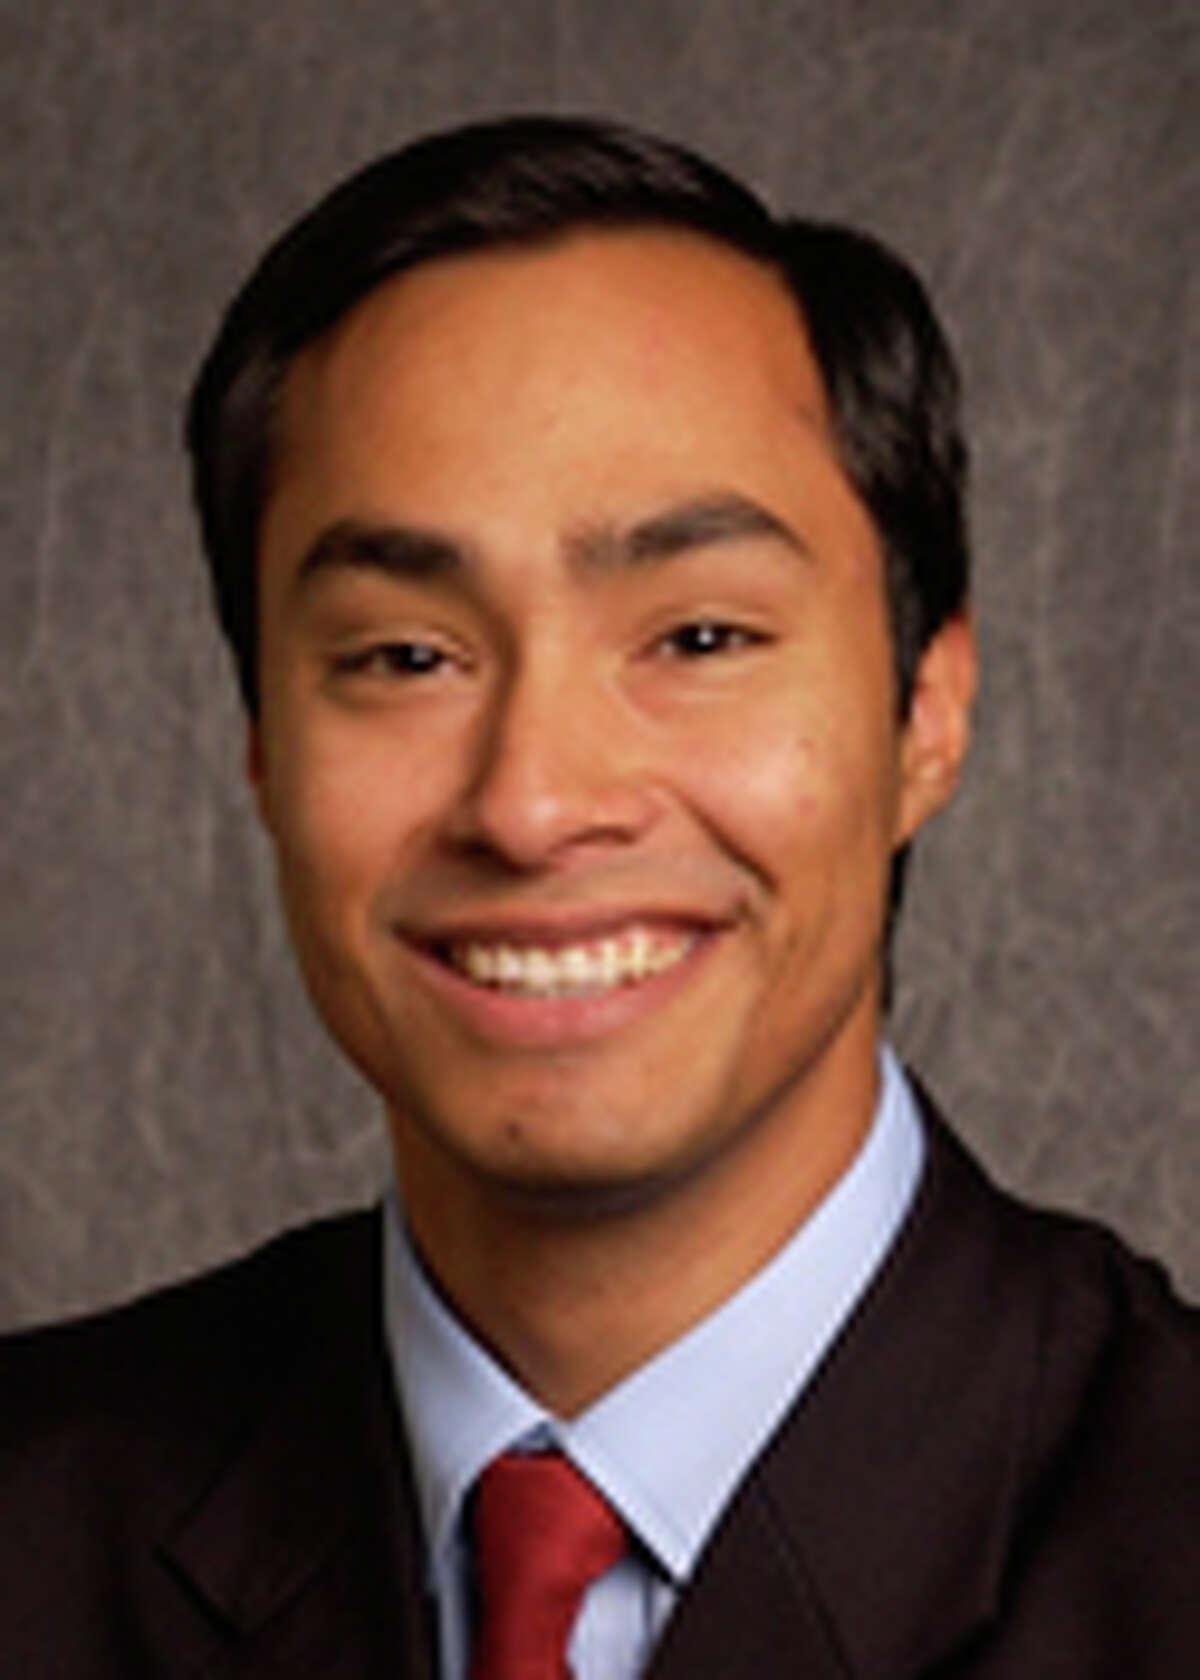 State Rep. Joaquin Castro, D-San Antonio